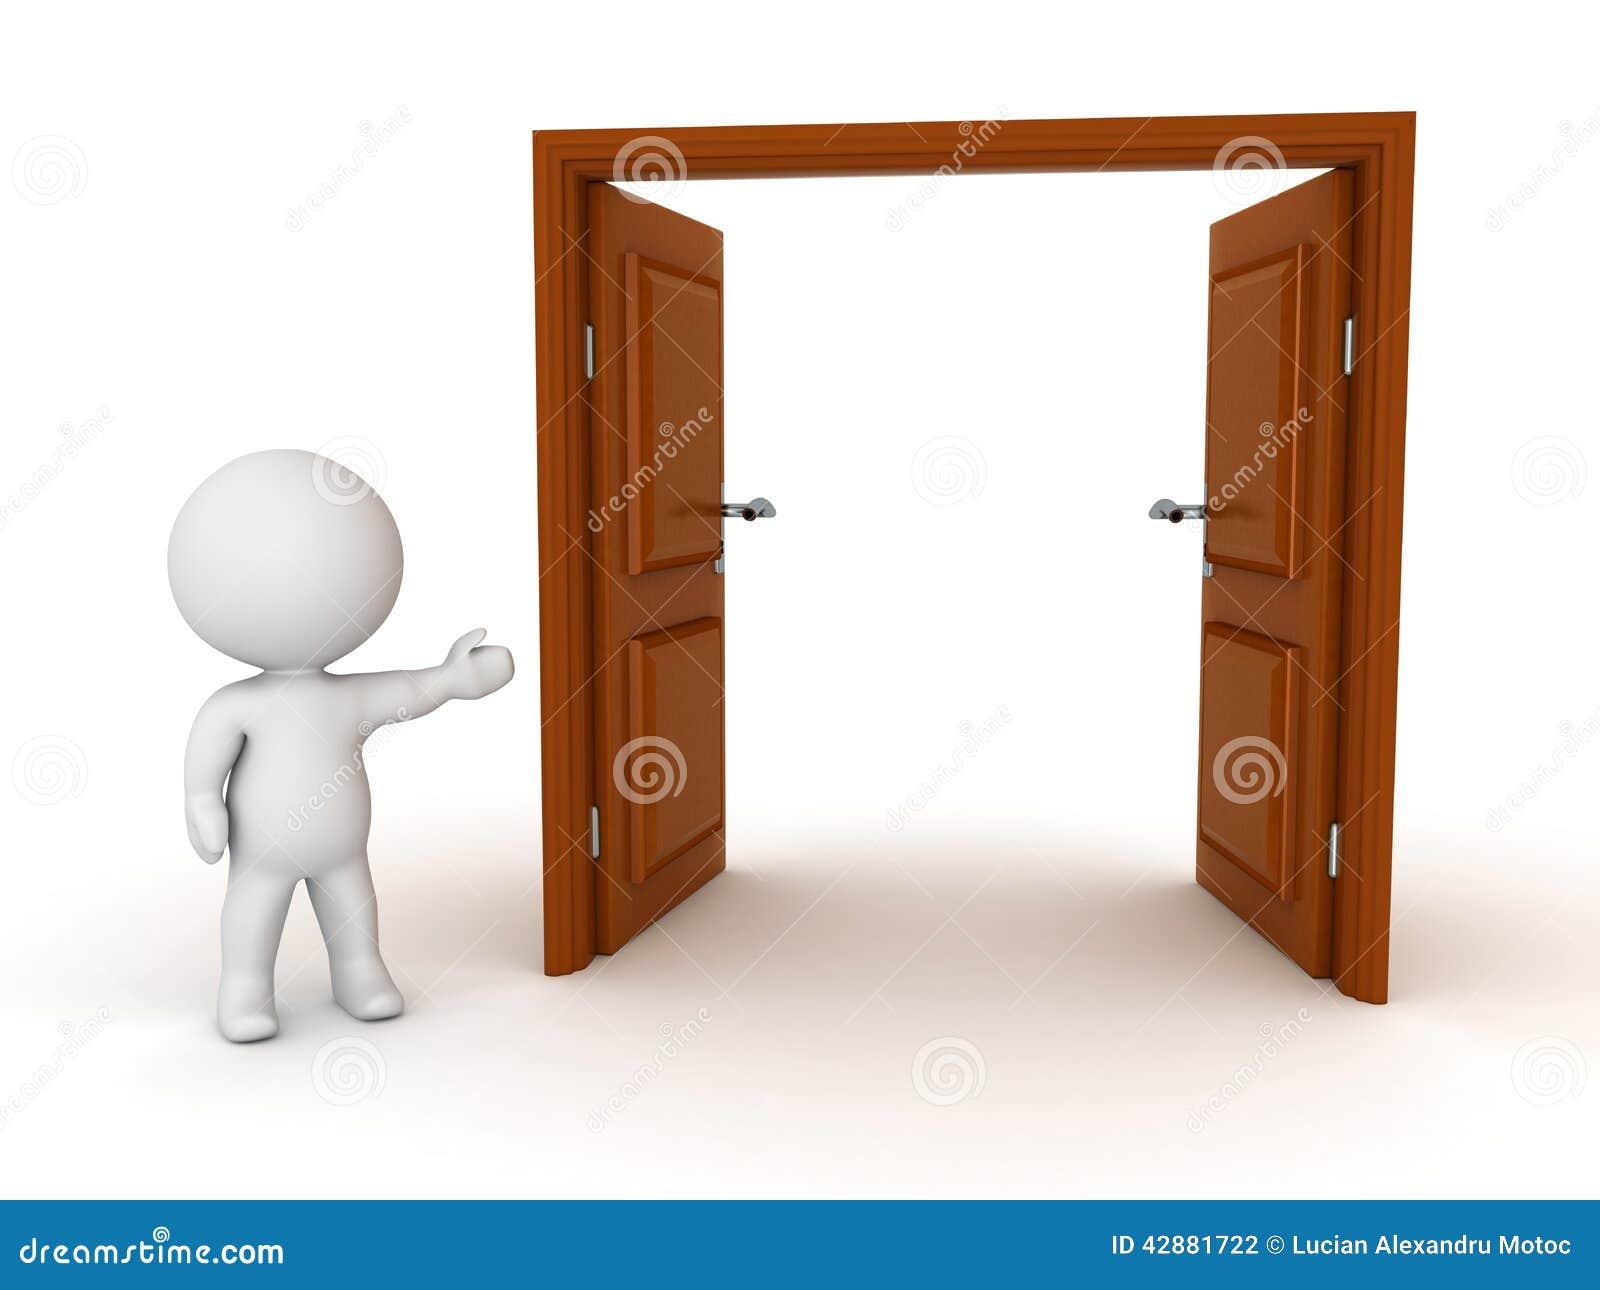 Offene tür  Charakter 3D, Der Offene Tür Zeigt Stock Abbildung - Bild: 42881722